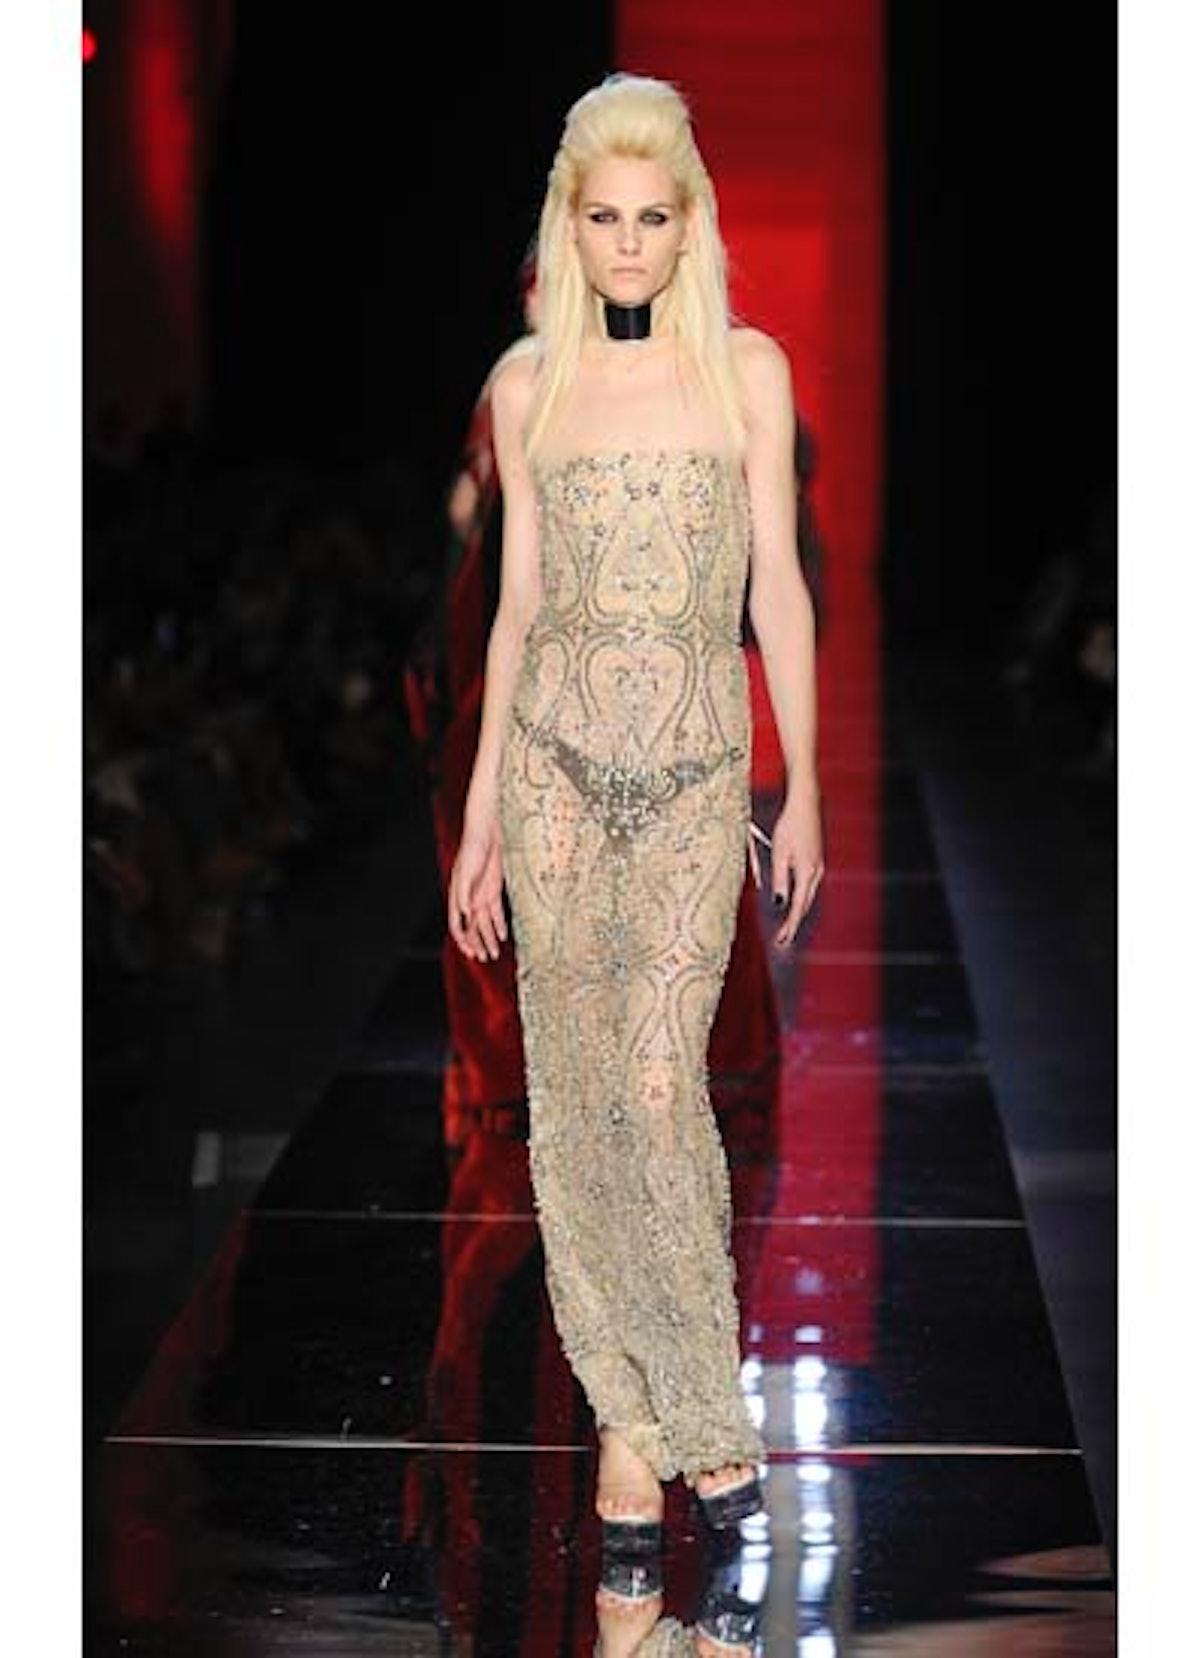 fass-jean-paul-gaultier-couture-2012-runway-55-v.jpg